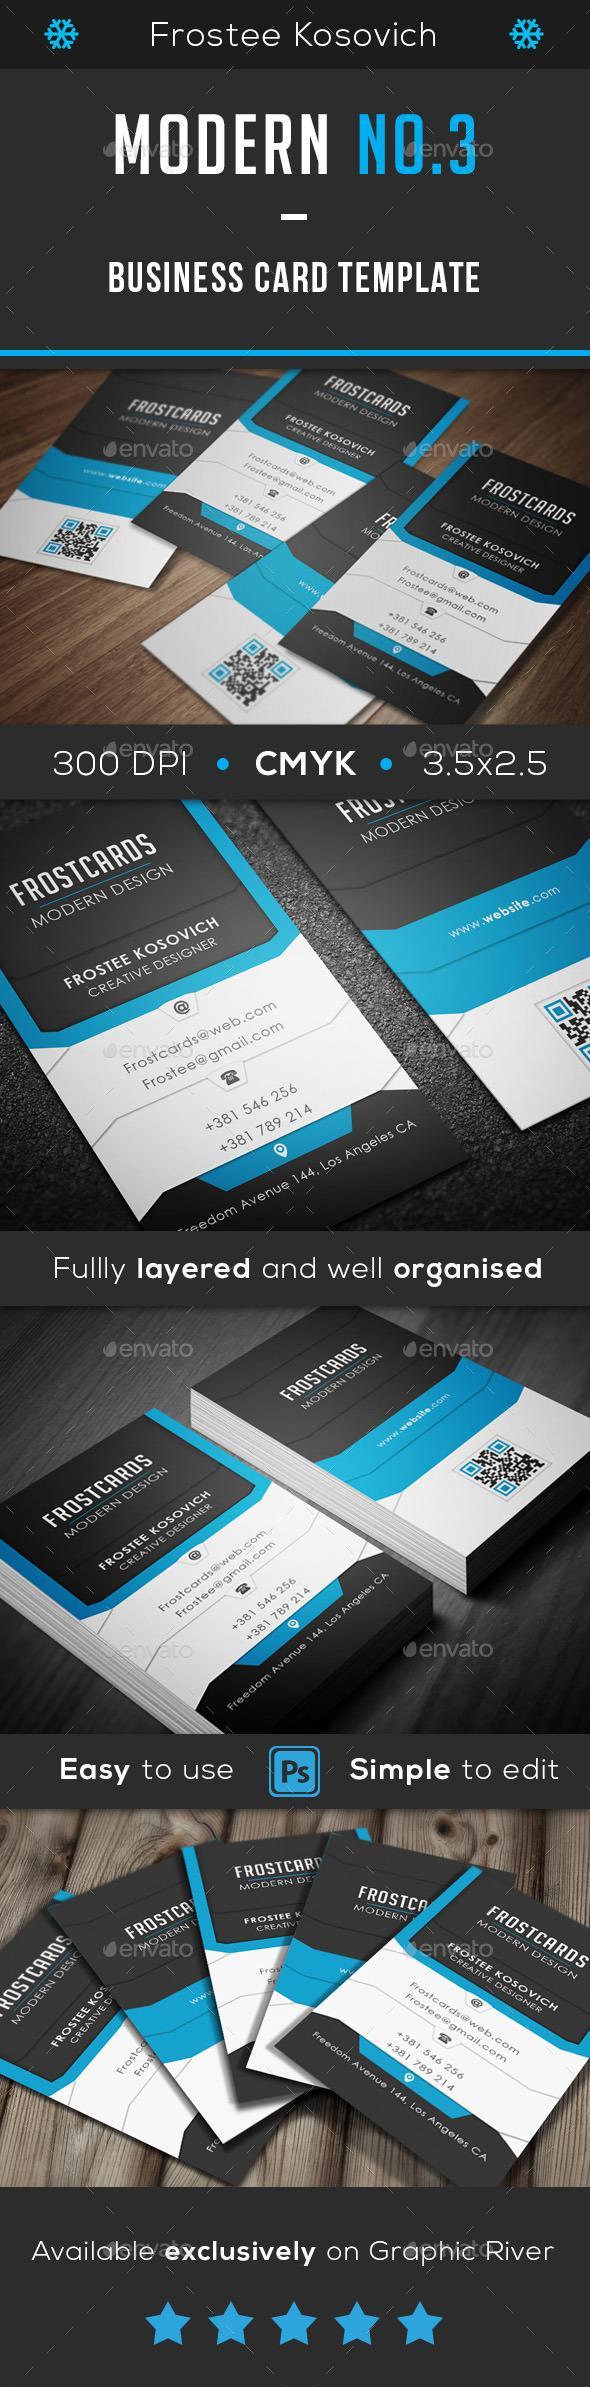 Modern Business Card Template No. 3  #template #creative #business